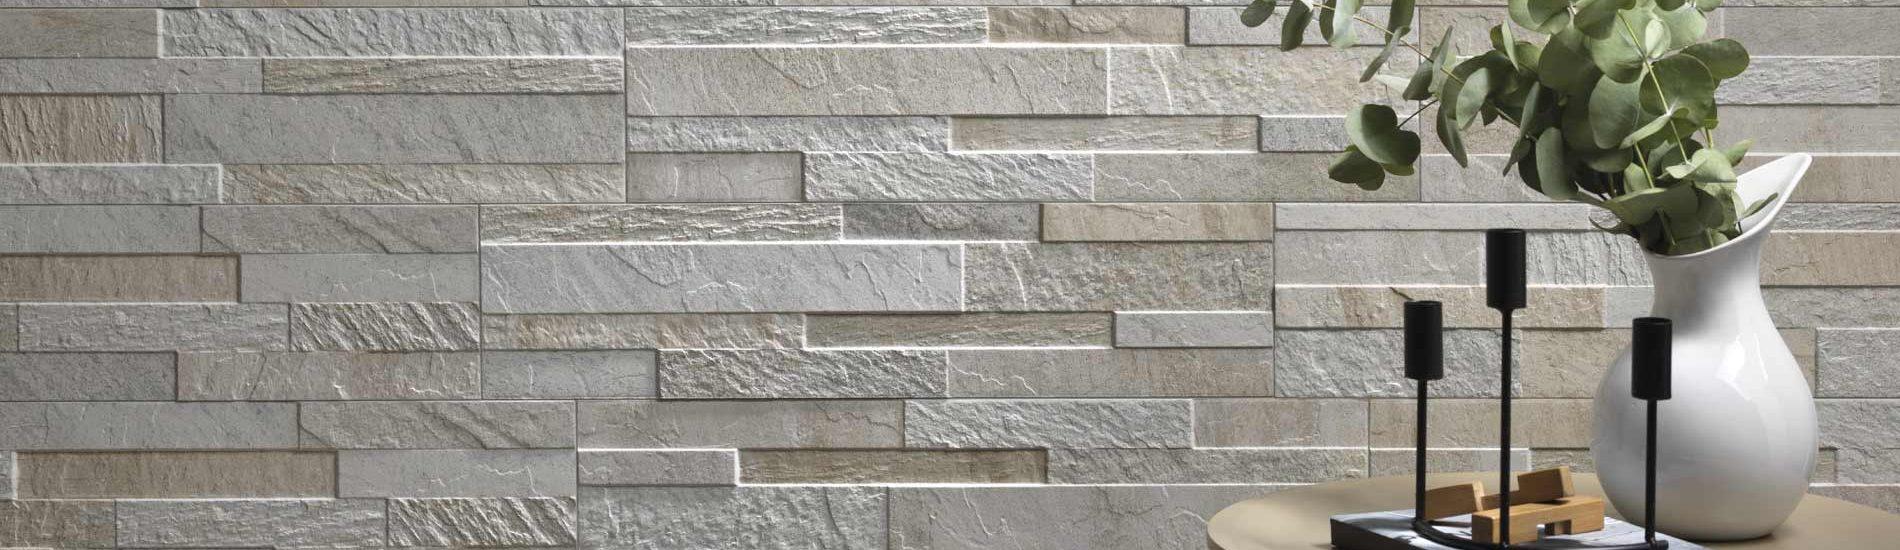 banner-cubics-3d-ledger-panel-wall-tile-ceramica-rondine